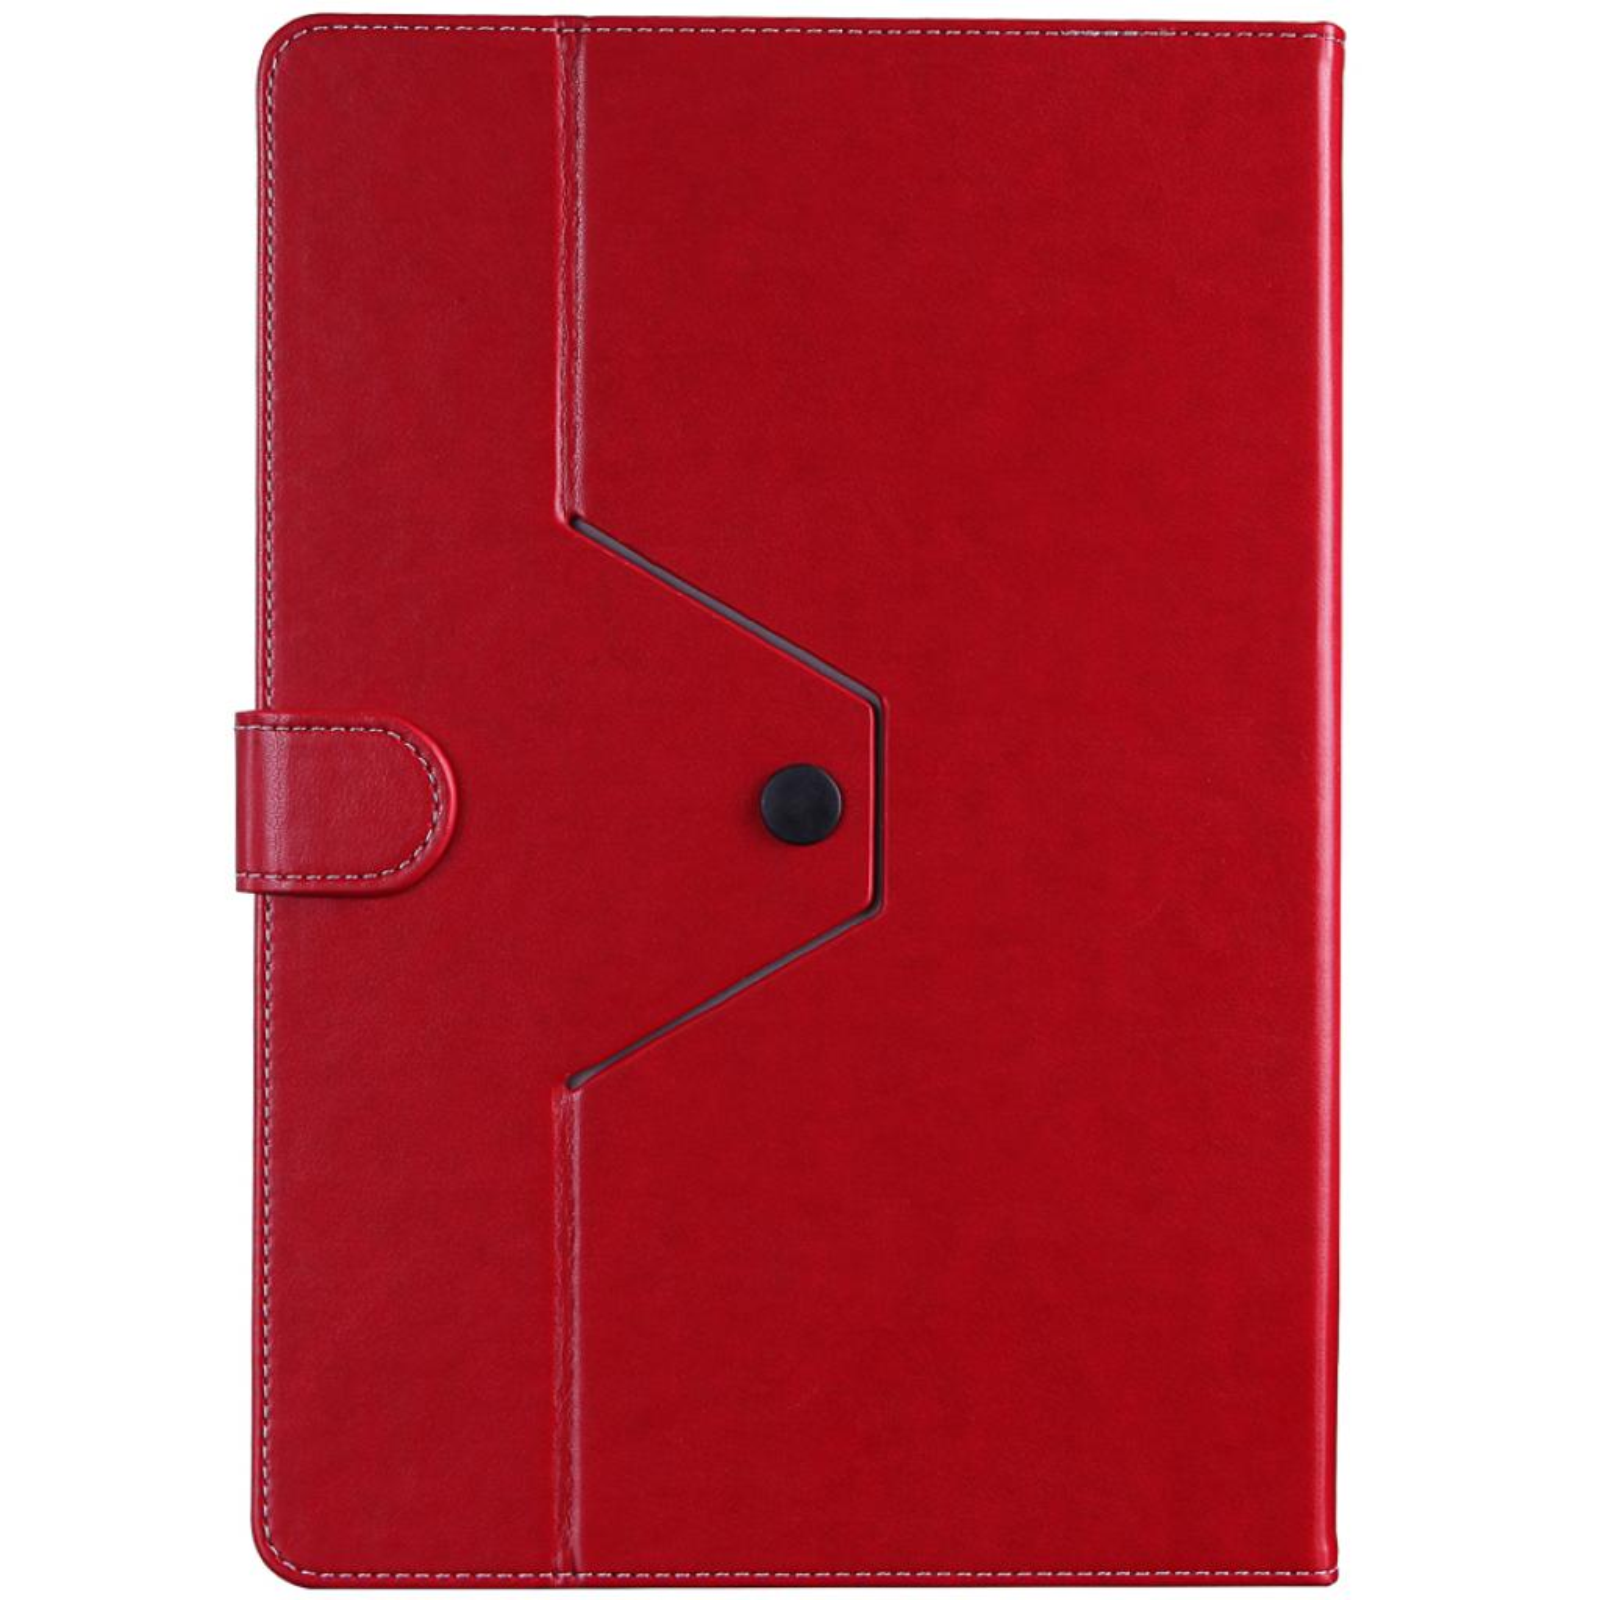 "Чехол для планшета PRESTIGIO 7"" Universal rotating RED (PTCL0207RD) изображение 2"